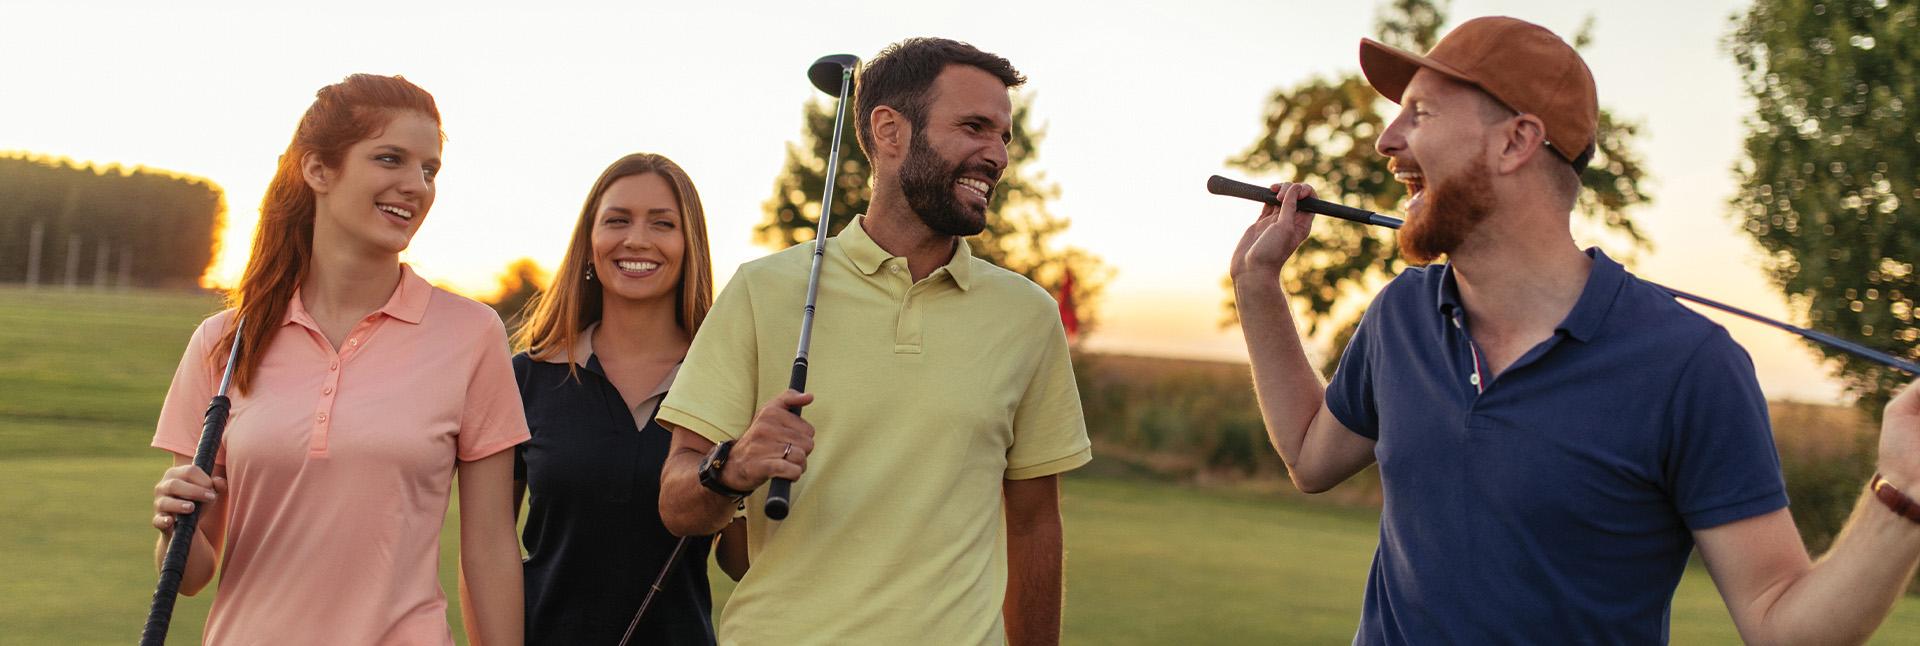 incentive-travel-golf